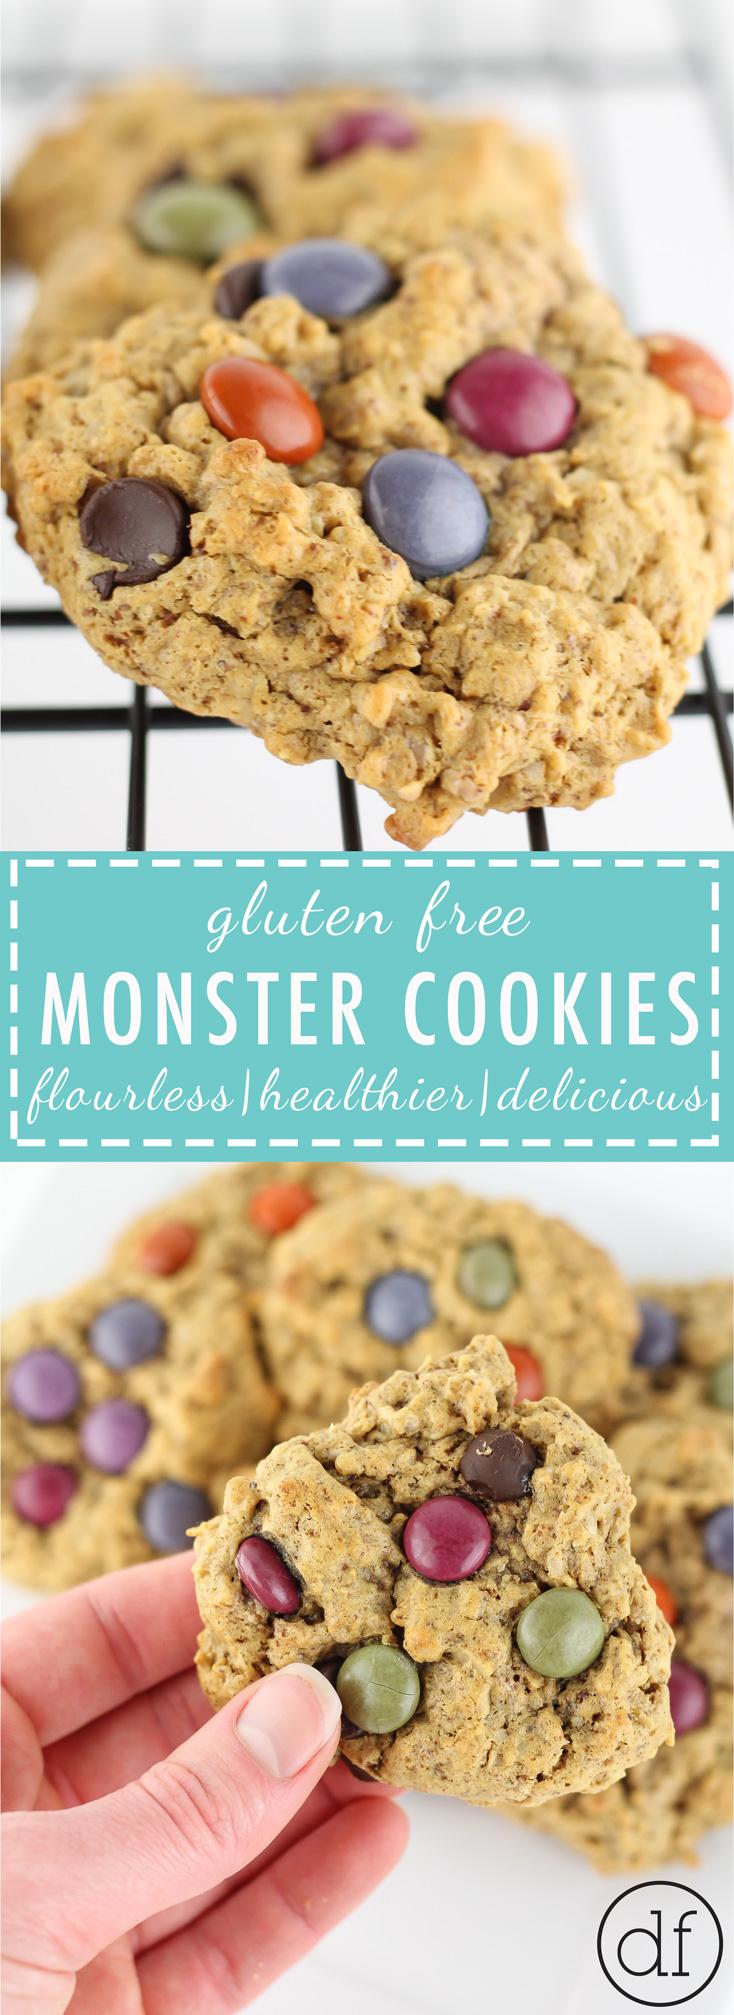 gluten free, monster cookies, christmas cookies, healthy monster cookies, define fettle, healthy christmas cookies, low sugar, no processed sugar, healthy treats, healthy choices, easy, simple, recipe, baking, gluten free cookies,